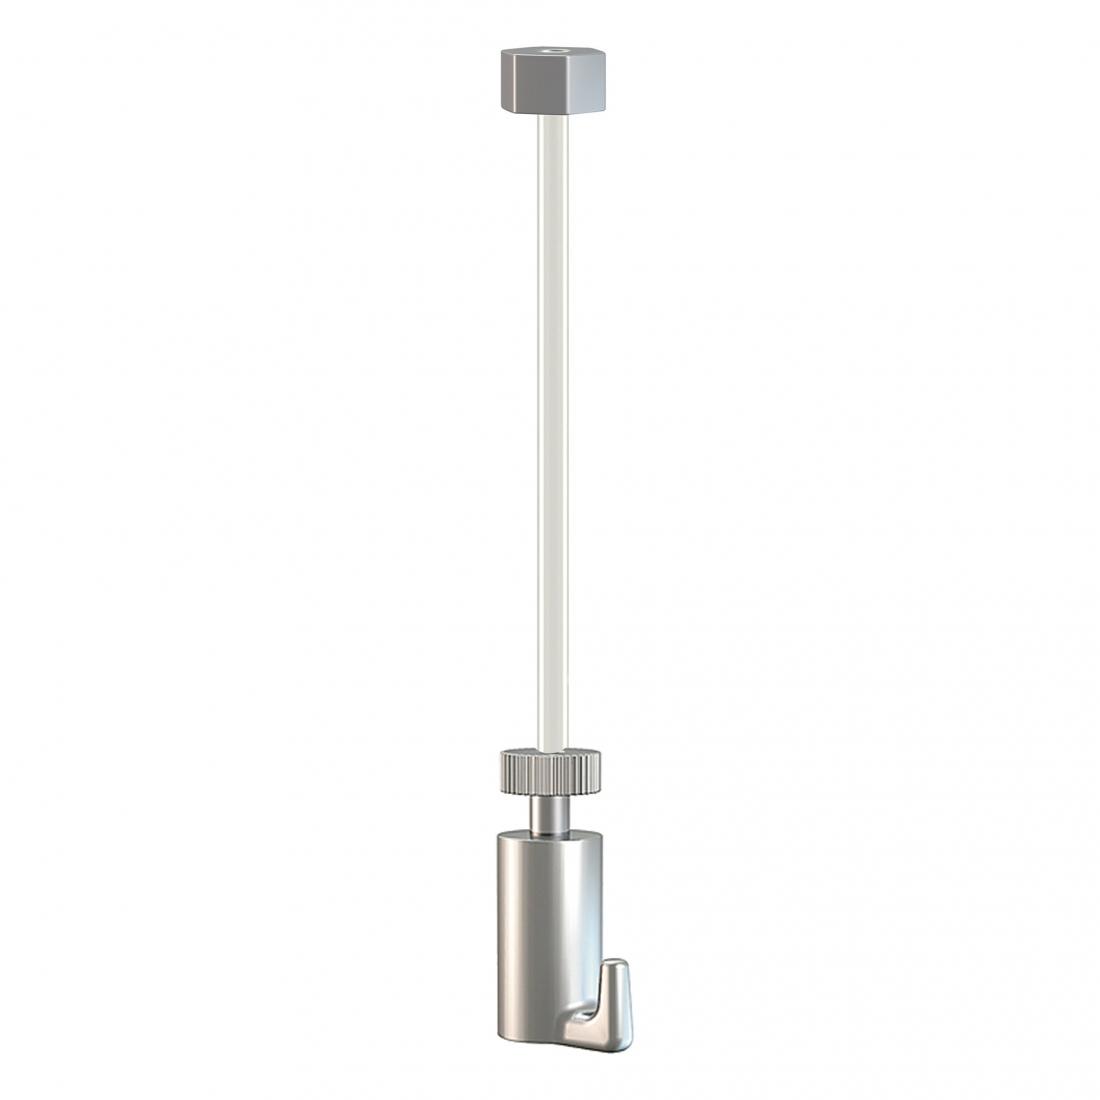 kit de cable de nylon con gancho colgador para guia para colgar cuadros con tope invisible, artiteq 15kg